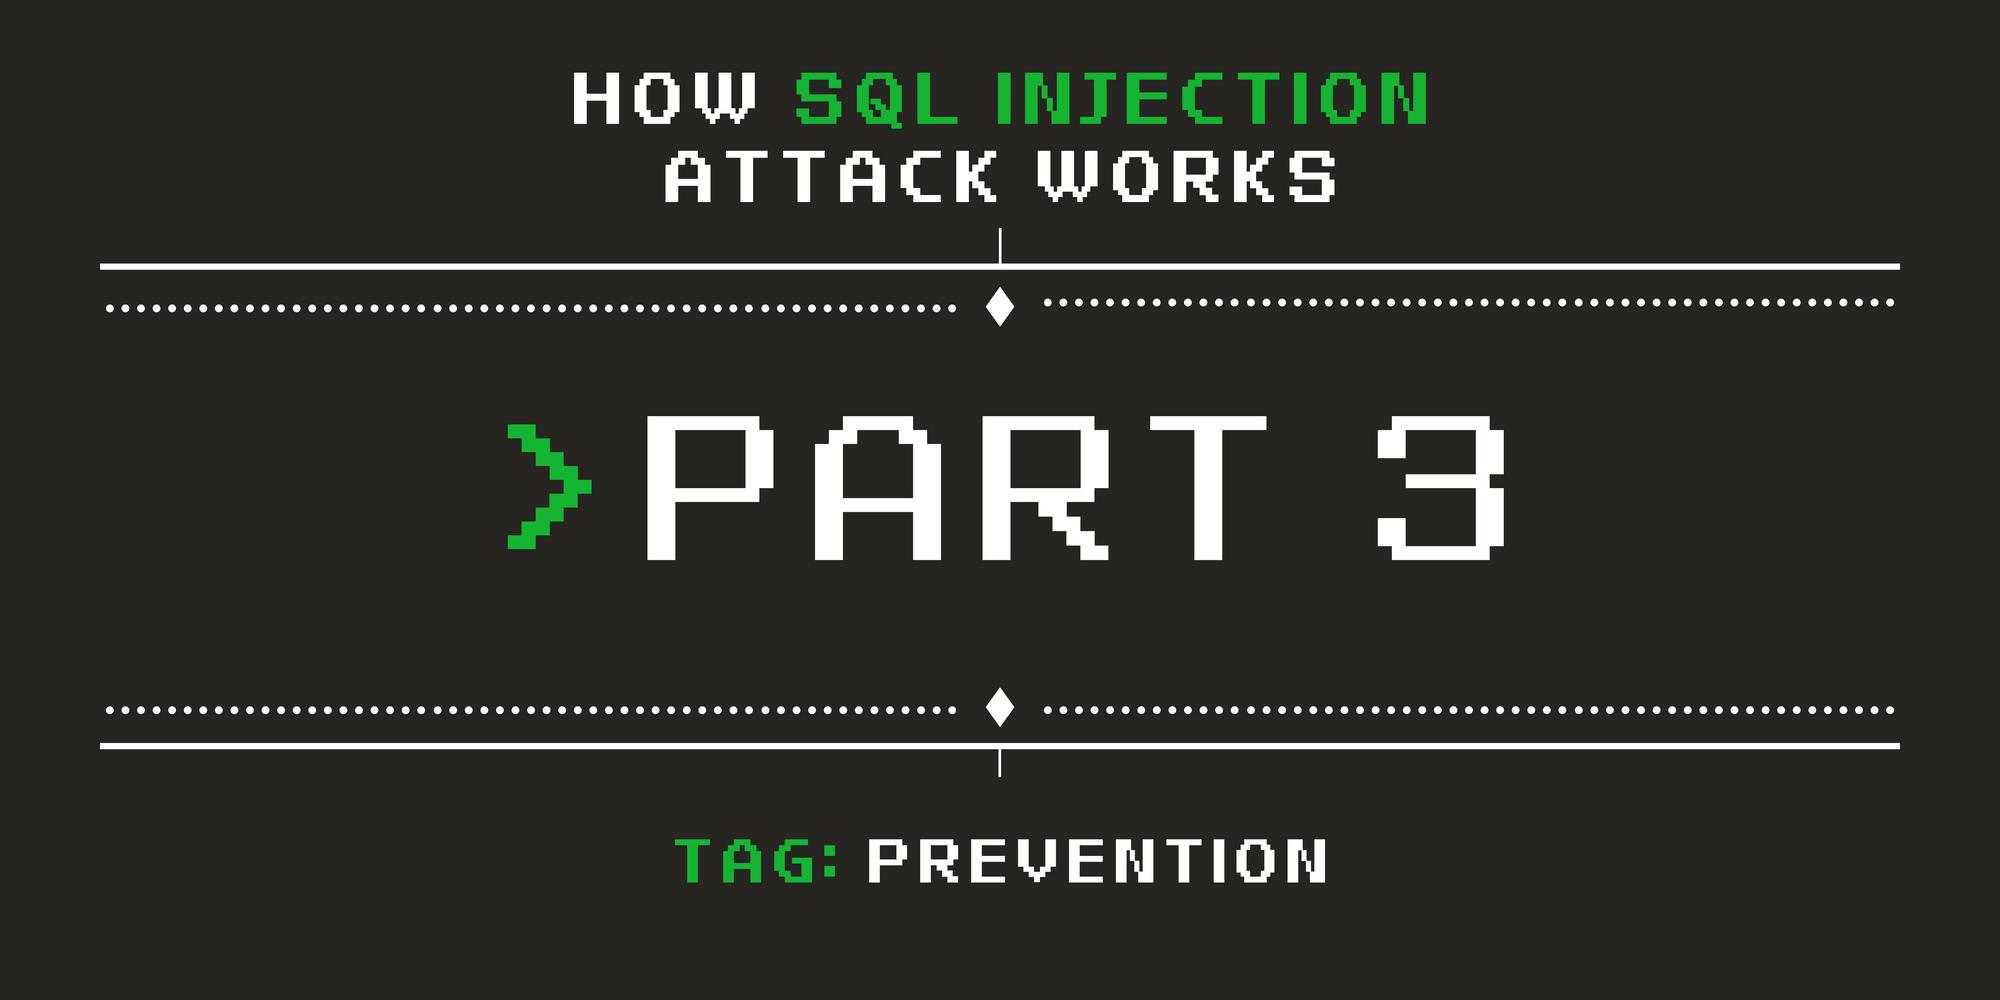 tag:prevention